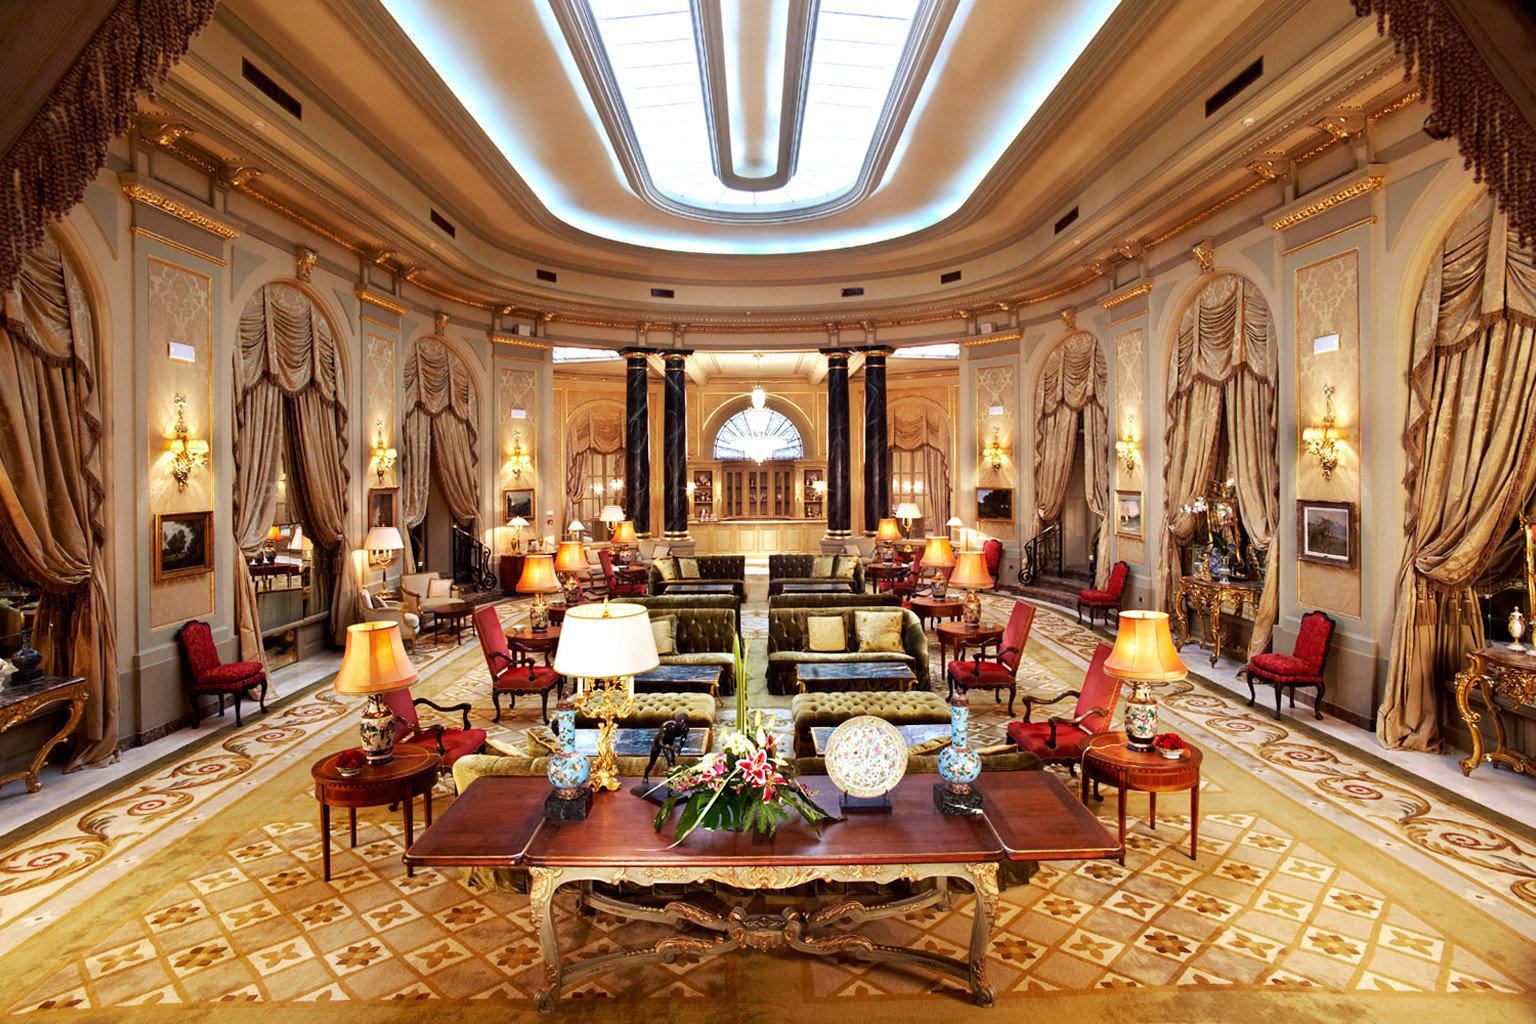 City Classic Elegant Lobby Lounge Luxury Romantic building palace function hall ballroom mansion